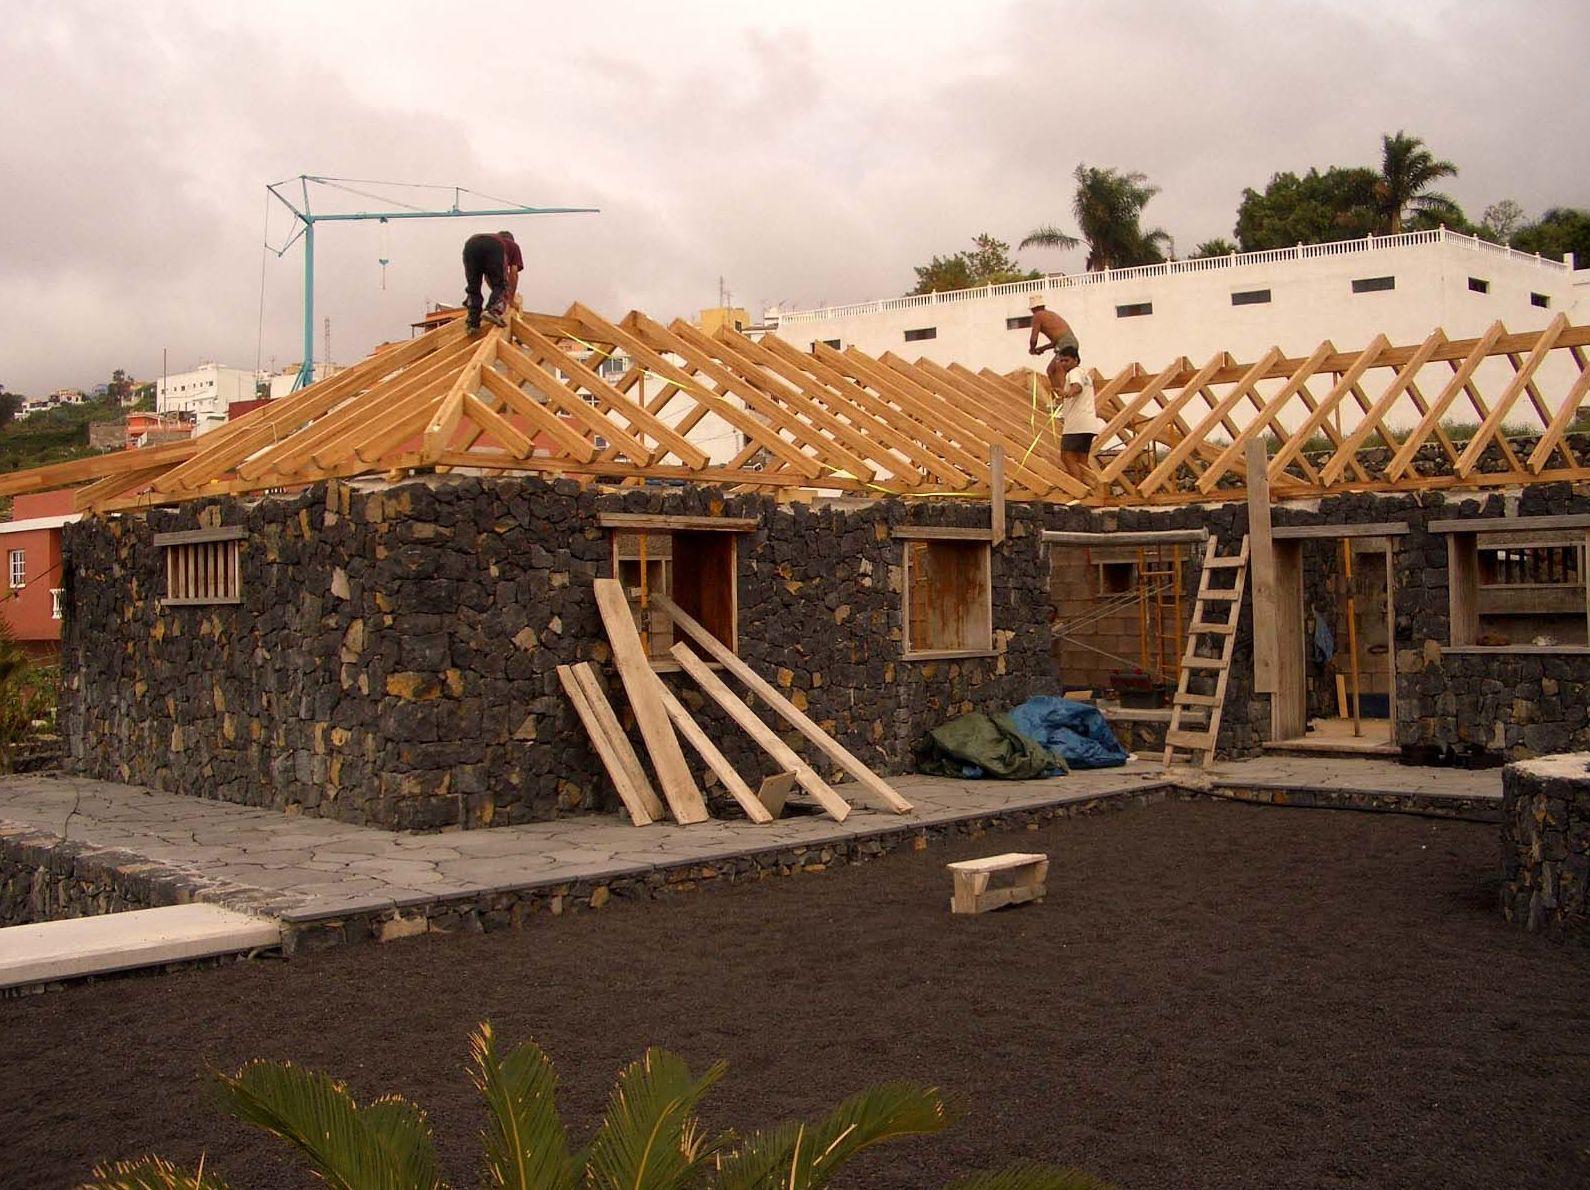 Wooden Roof installation Tenerife - Cortelima